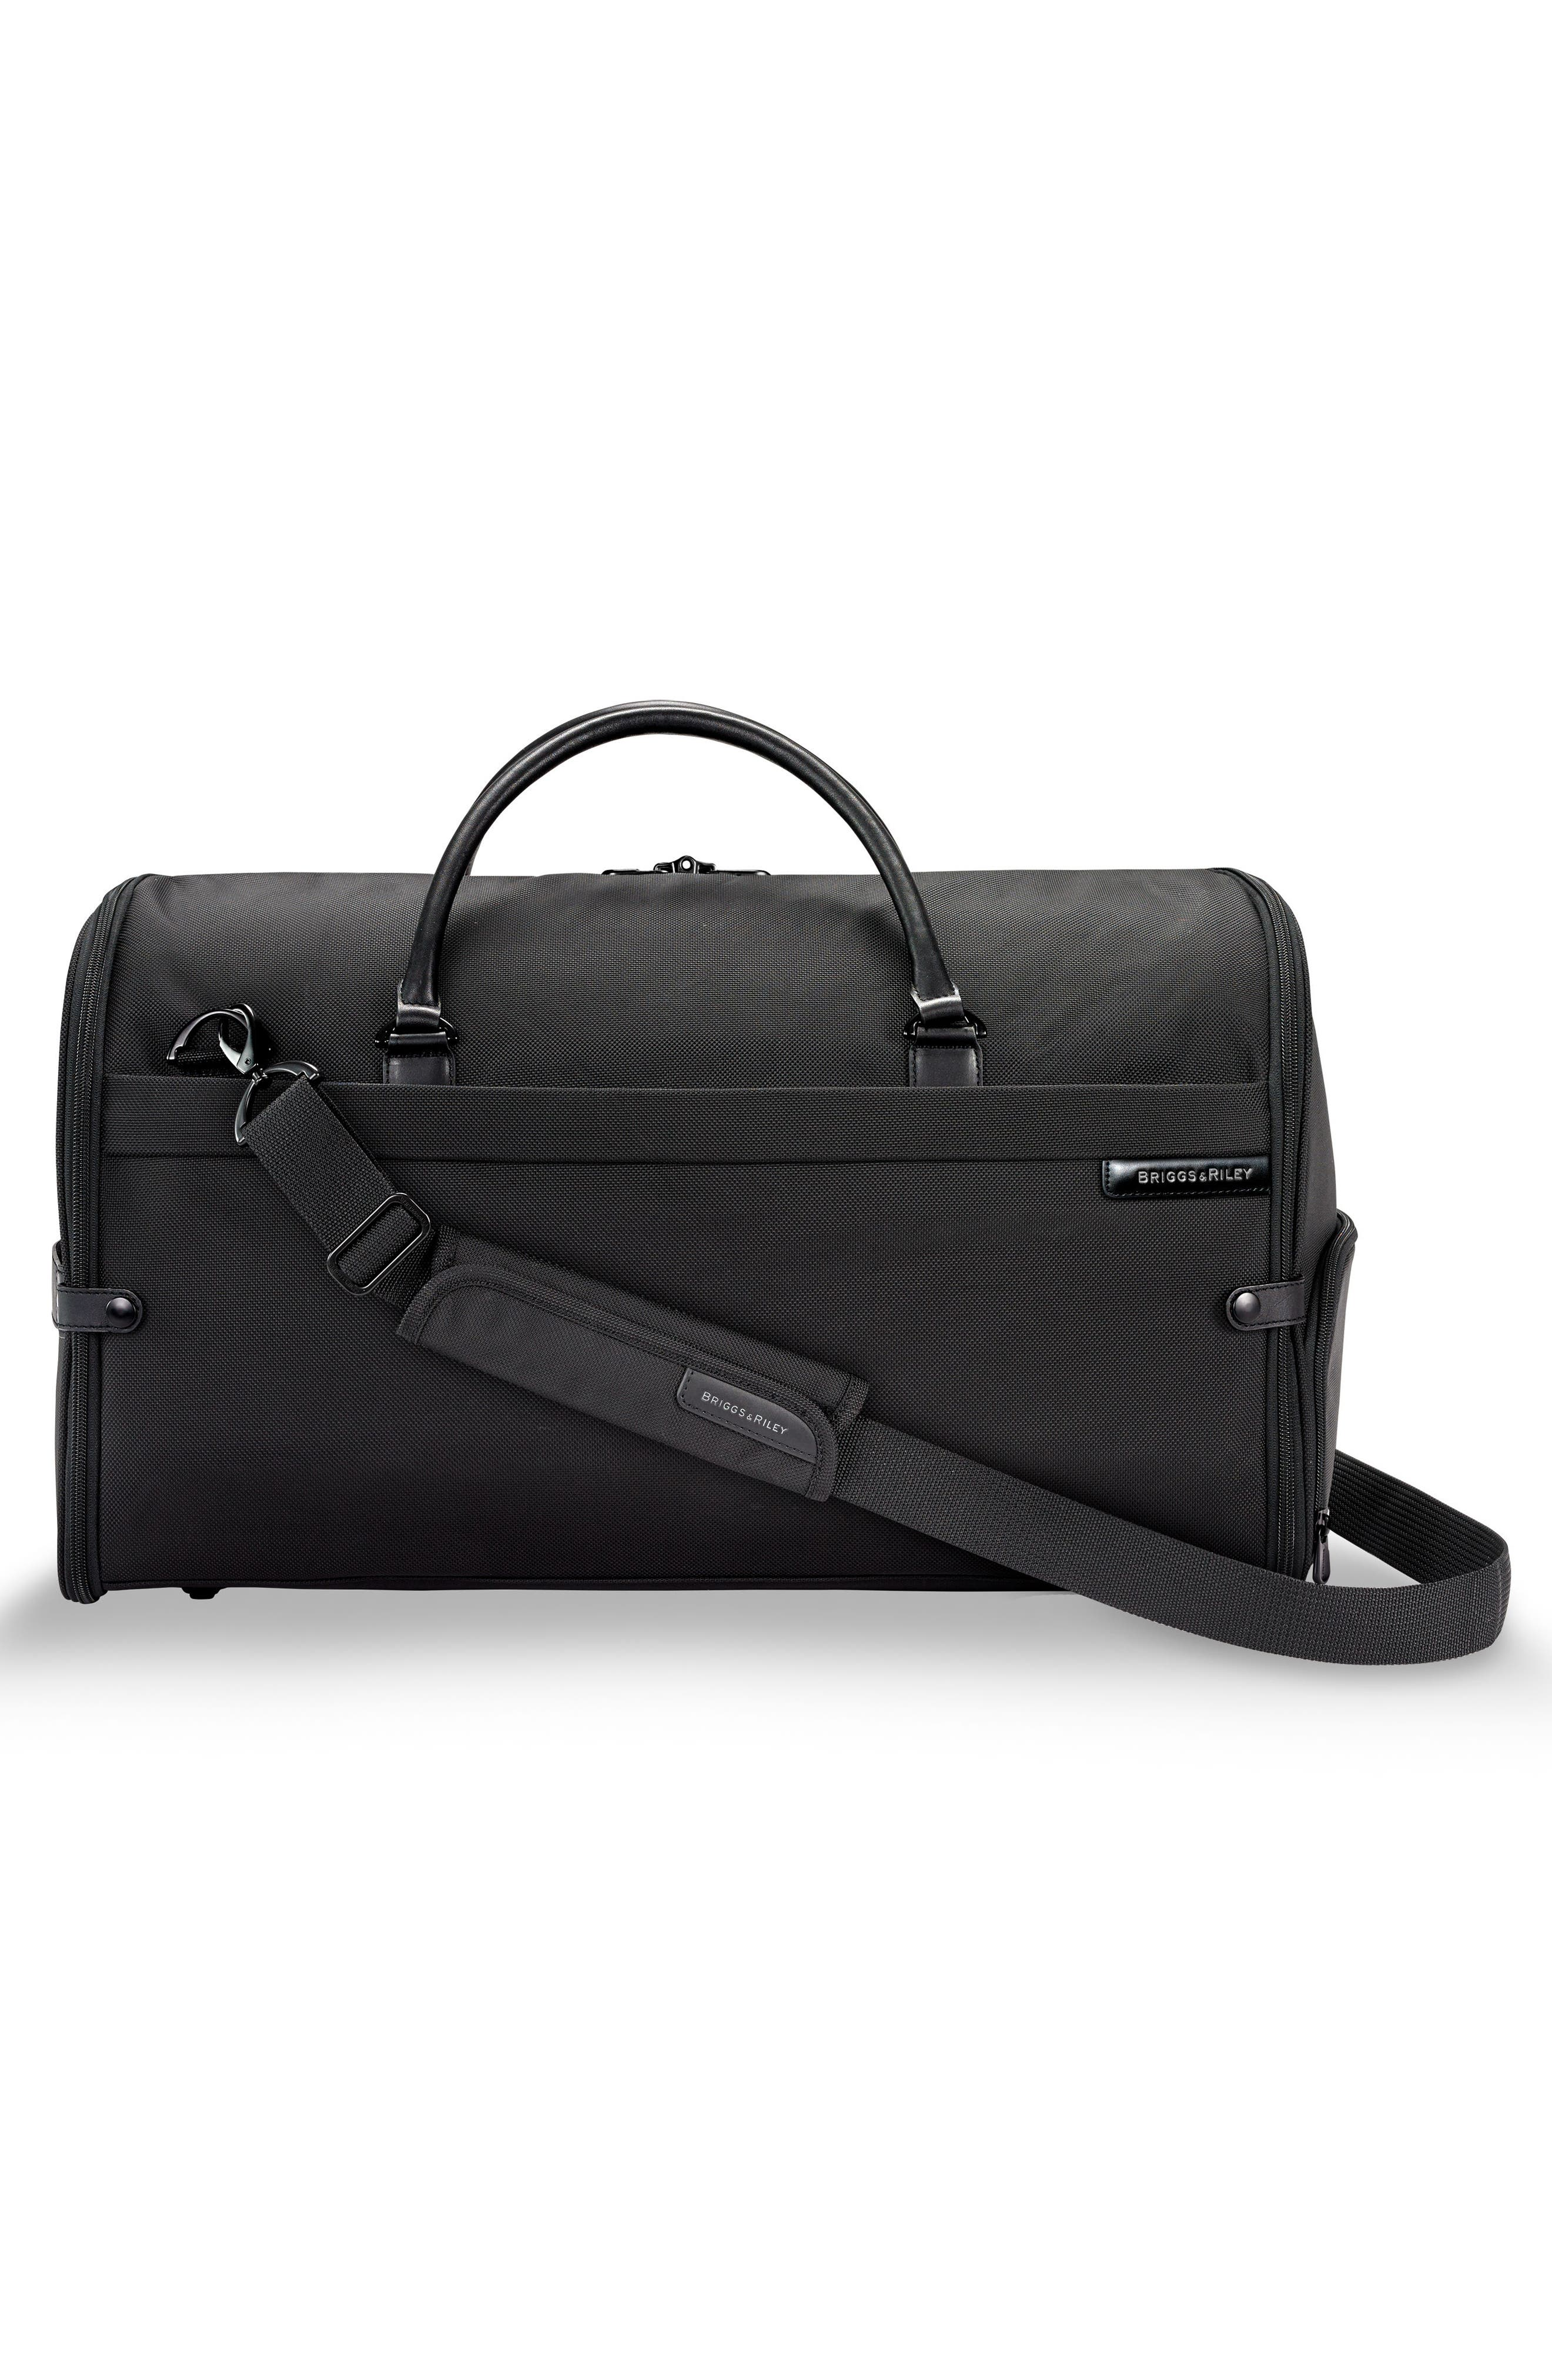 BRIGGS & RILEY,                             Baseline Suiter Duffel Bag,                             Alternate thumbnail 3, color,                             BLACK